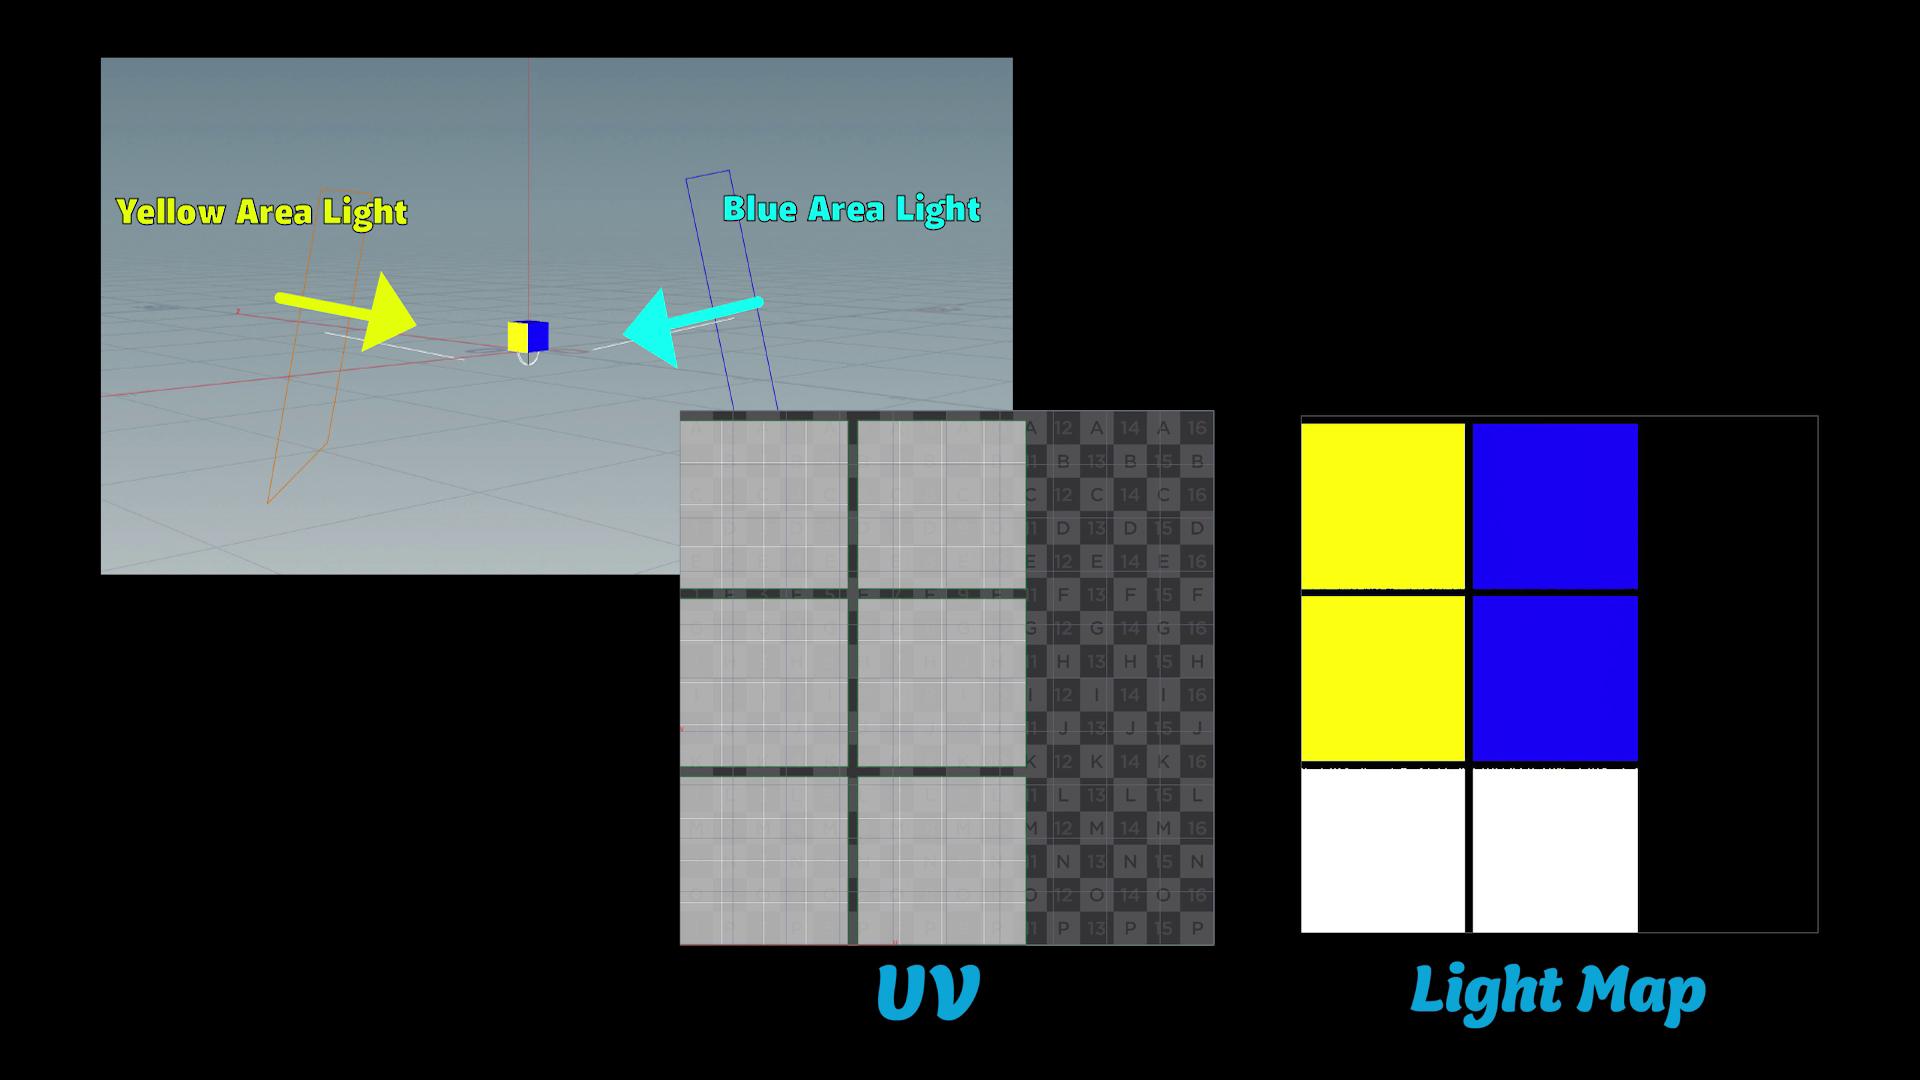 Light Maps bake lighting data onto textures based on the UV coordinates of the geometry.